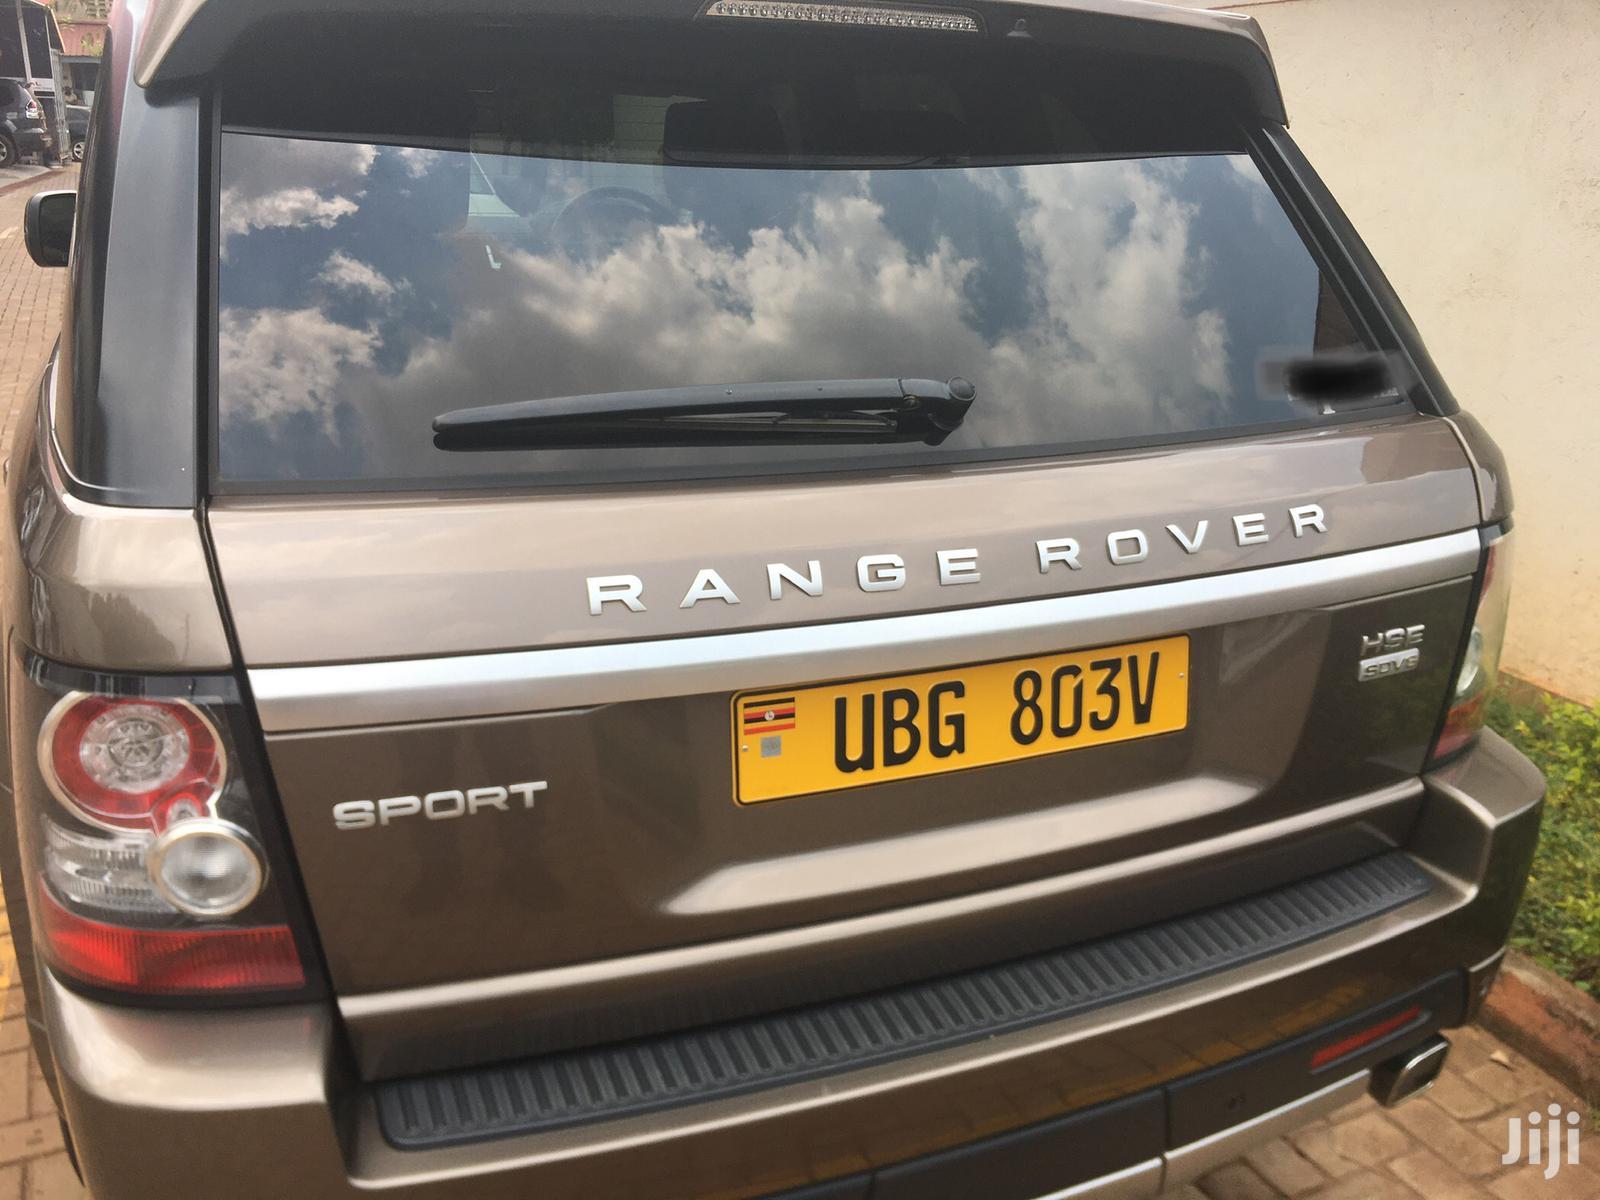 Land Rover Range Rover Sport 2012 Brown | Cars for sale in Kampala, Central Region, Uganda